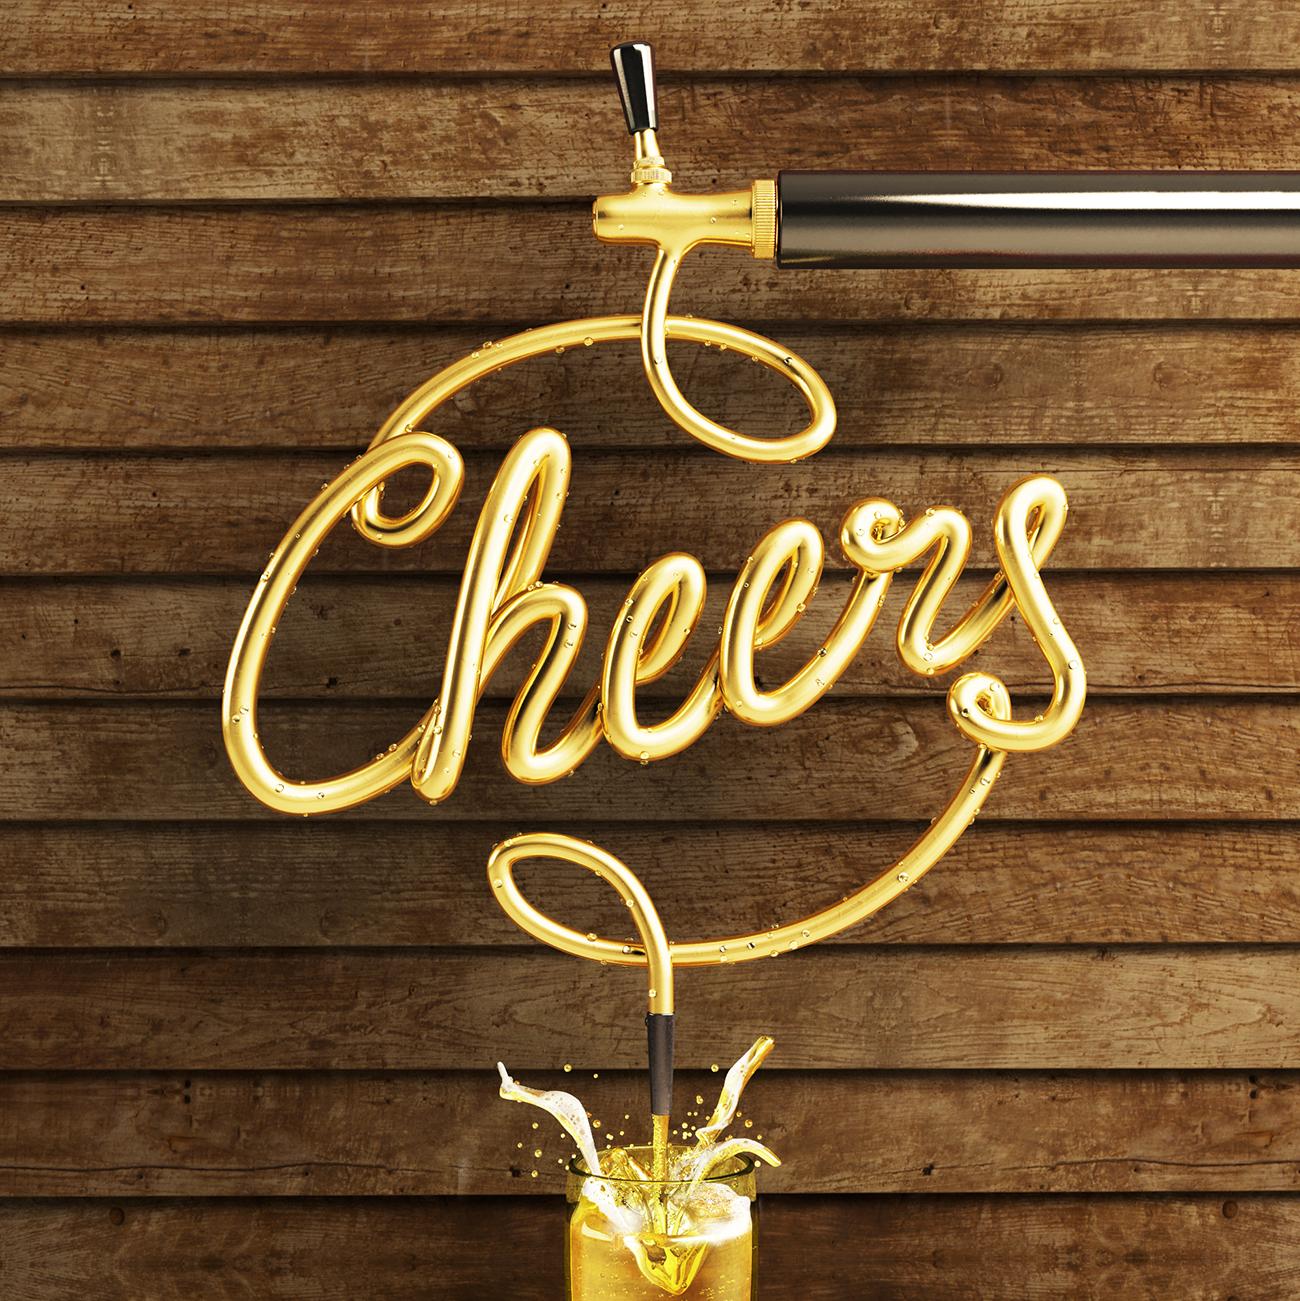 YIPPIEHEY_Cheers